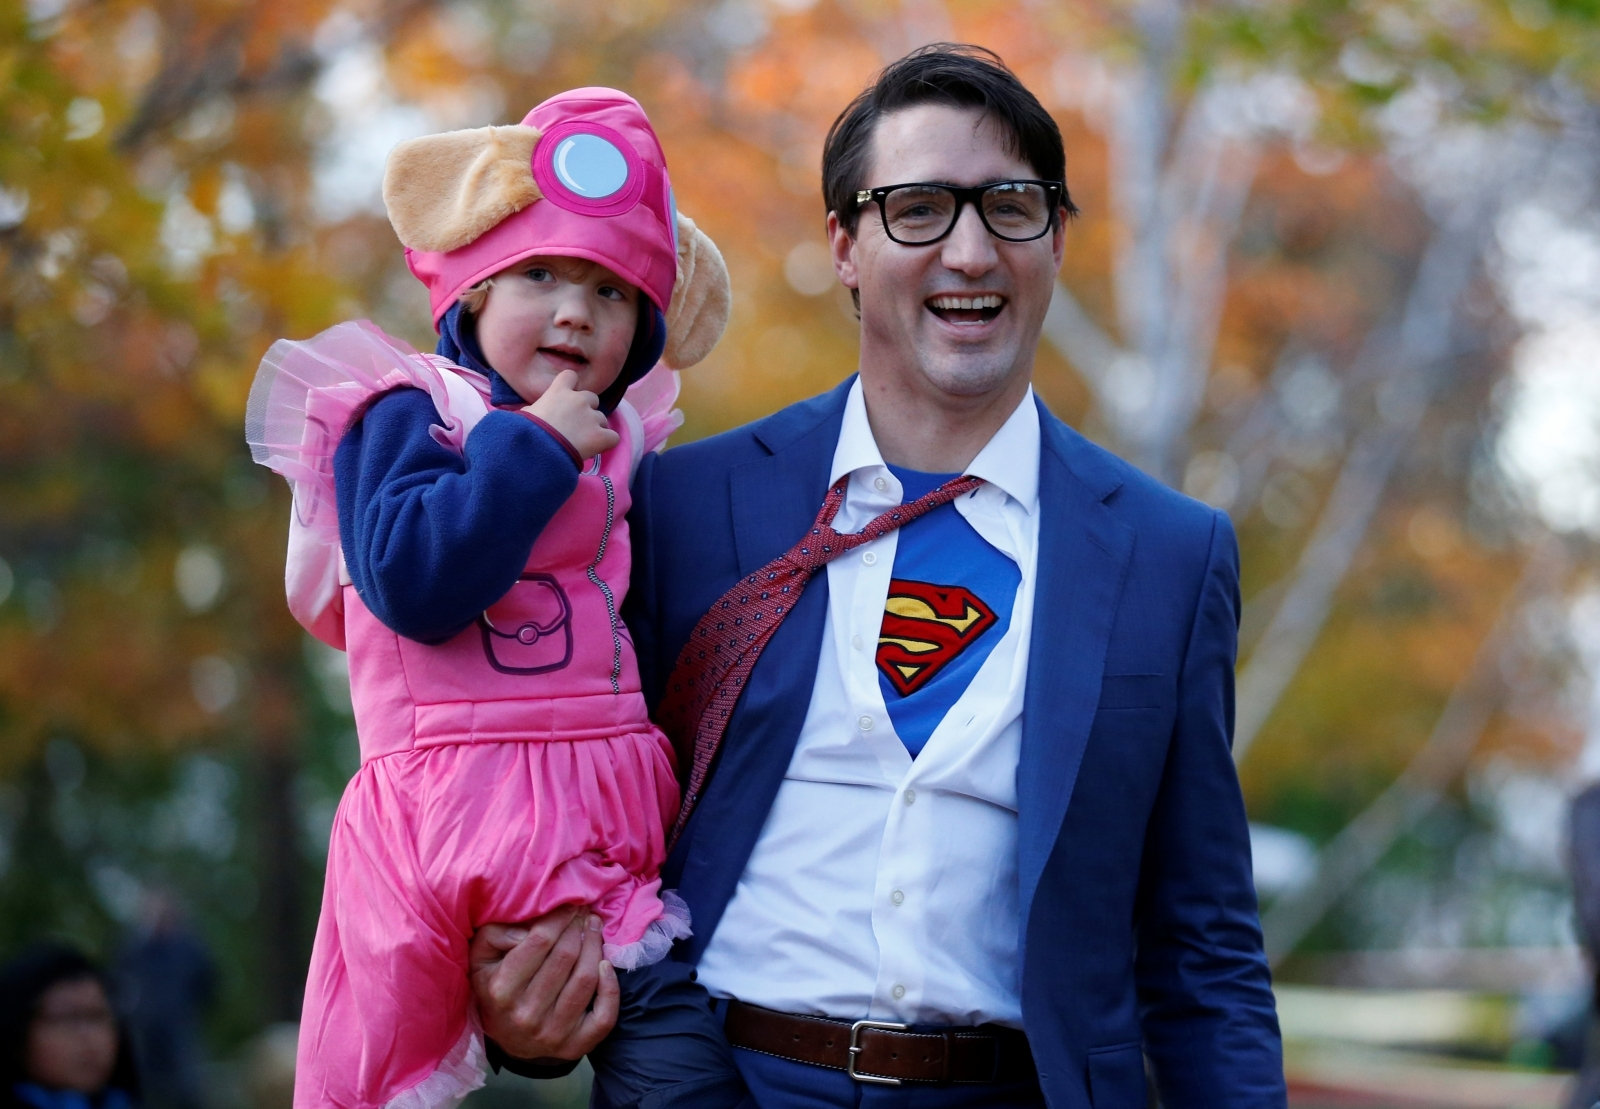 Justin Trudeau Halloween